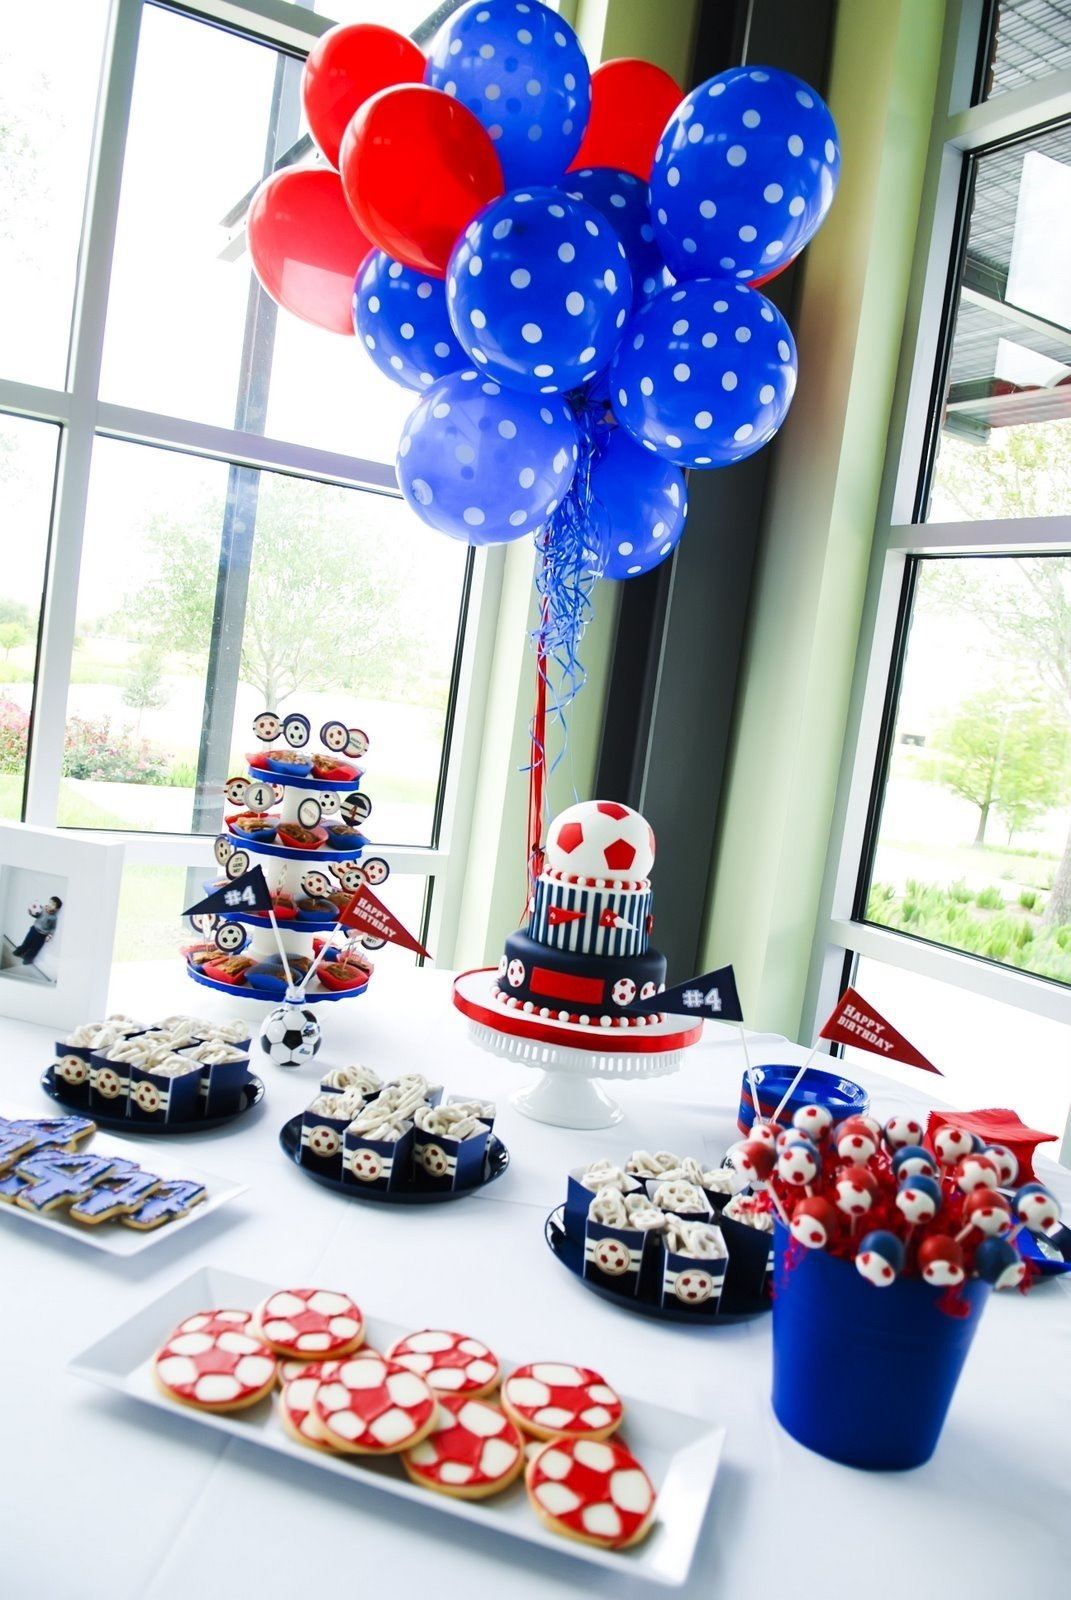 10 Unique Birthday Party Ideas For Boys Age 7 50 awesome boys birthday party ideas i heart naptime 50 2020